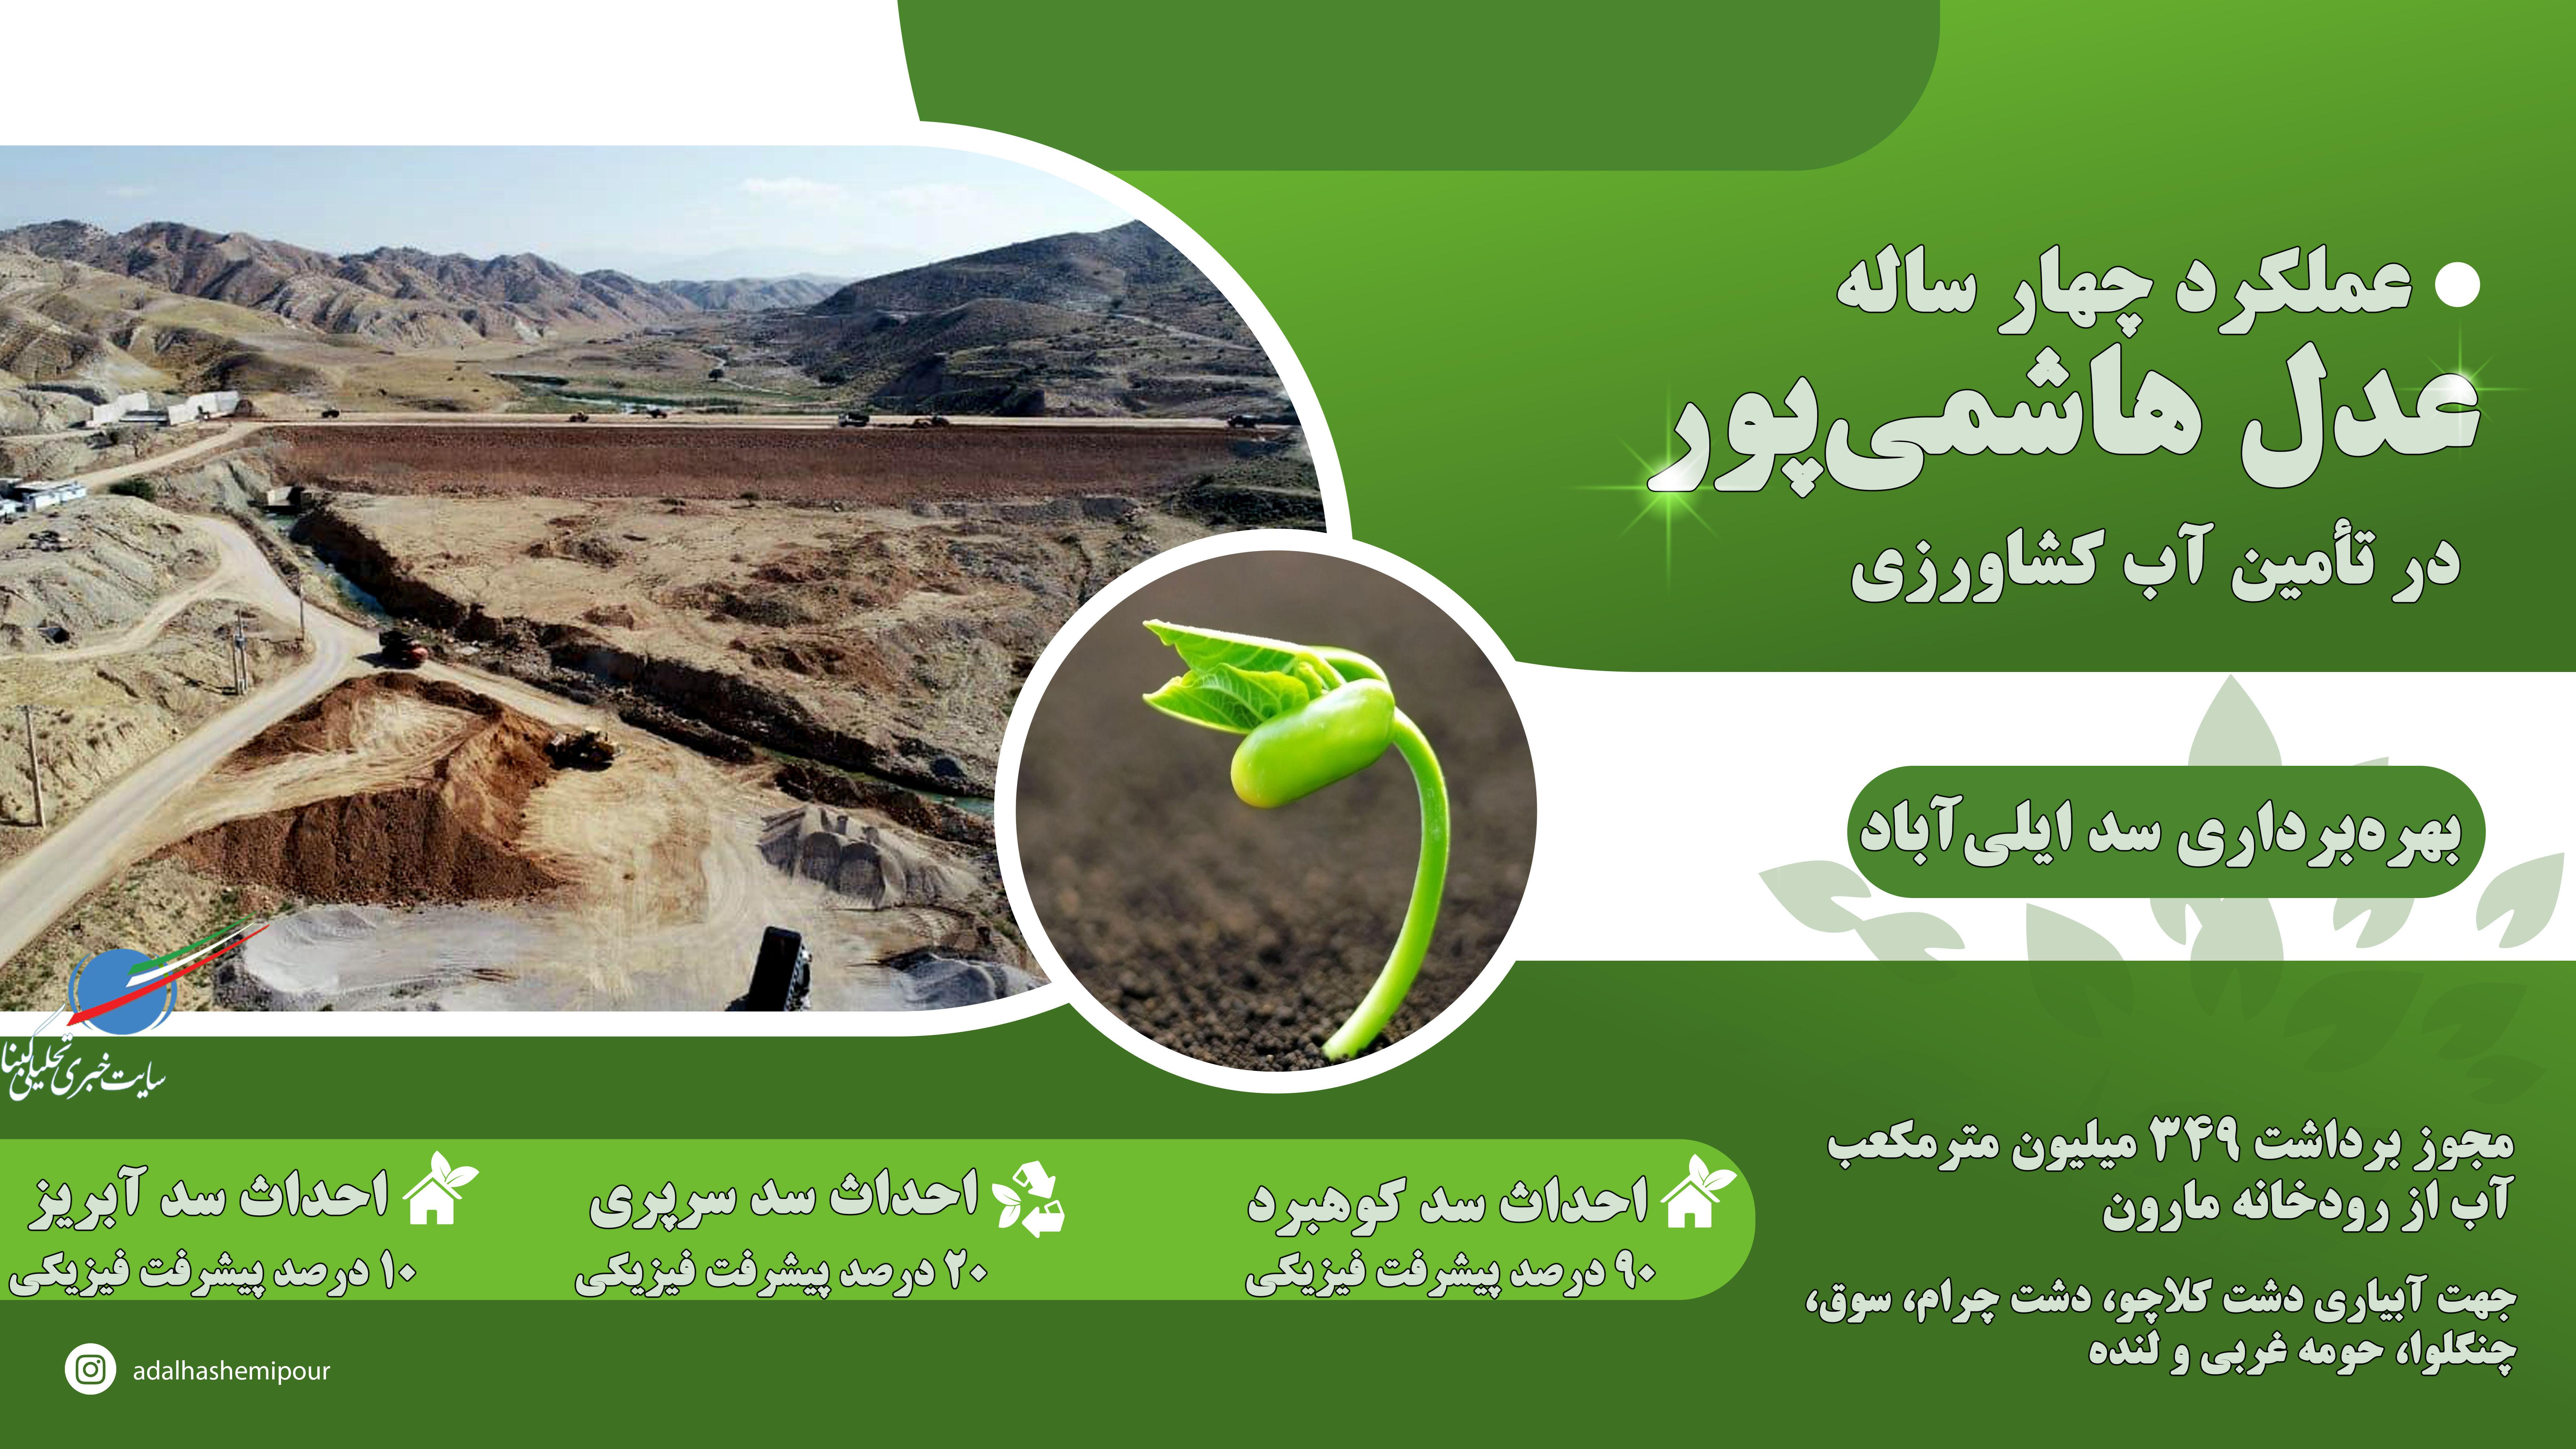 http://www.kebnanews.ir/images/docs/files/000421/nf00421085-1.jpg